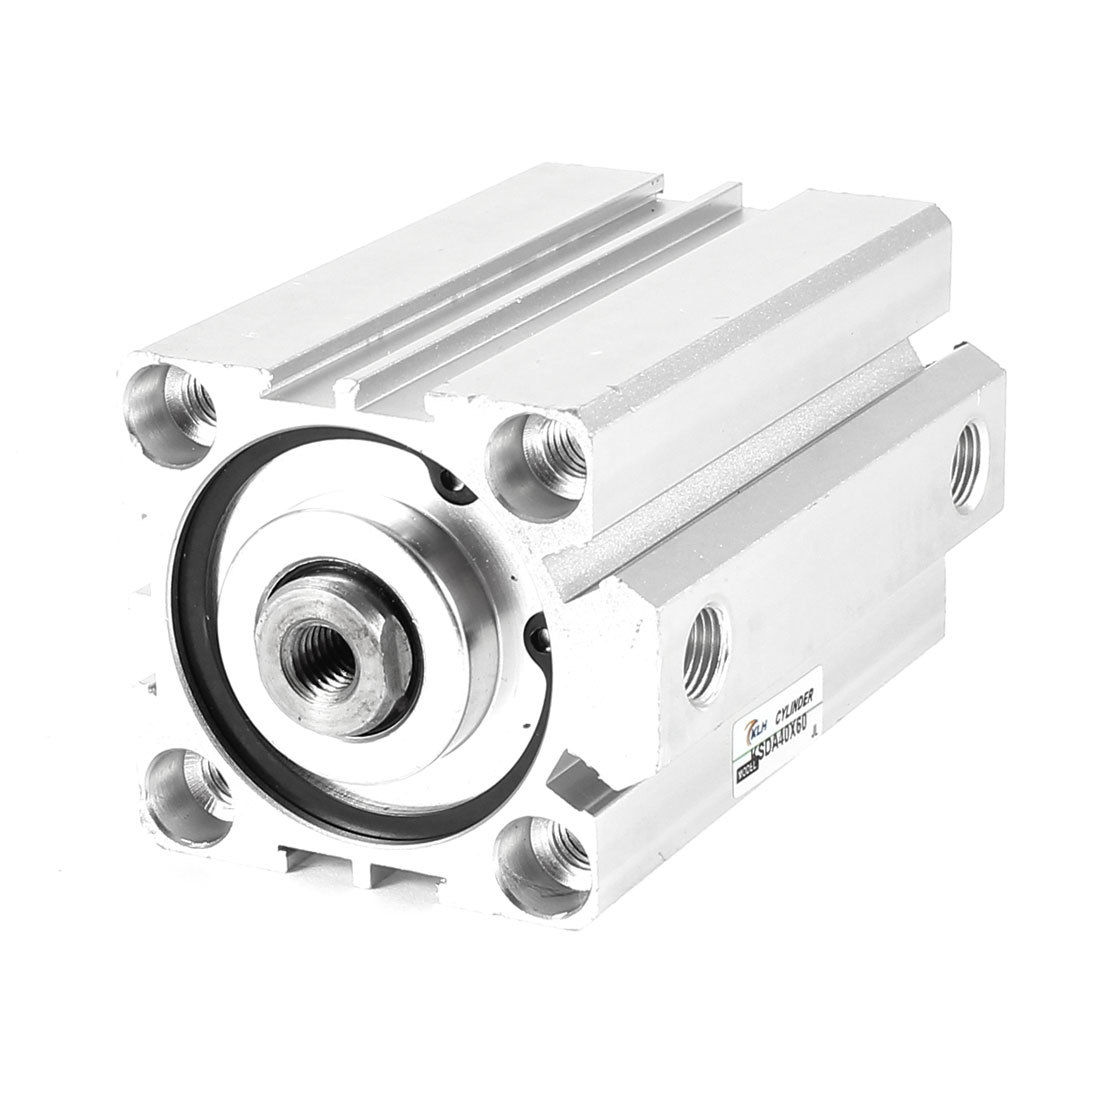 1 Pcs 50mm Bore 20mm Stroke Stainless steel Pneumatic Air Cylinder SDA50-20 1 pcs 50mm bore 25mm stroke stainless steel pneumatic air cylinder sda50 25